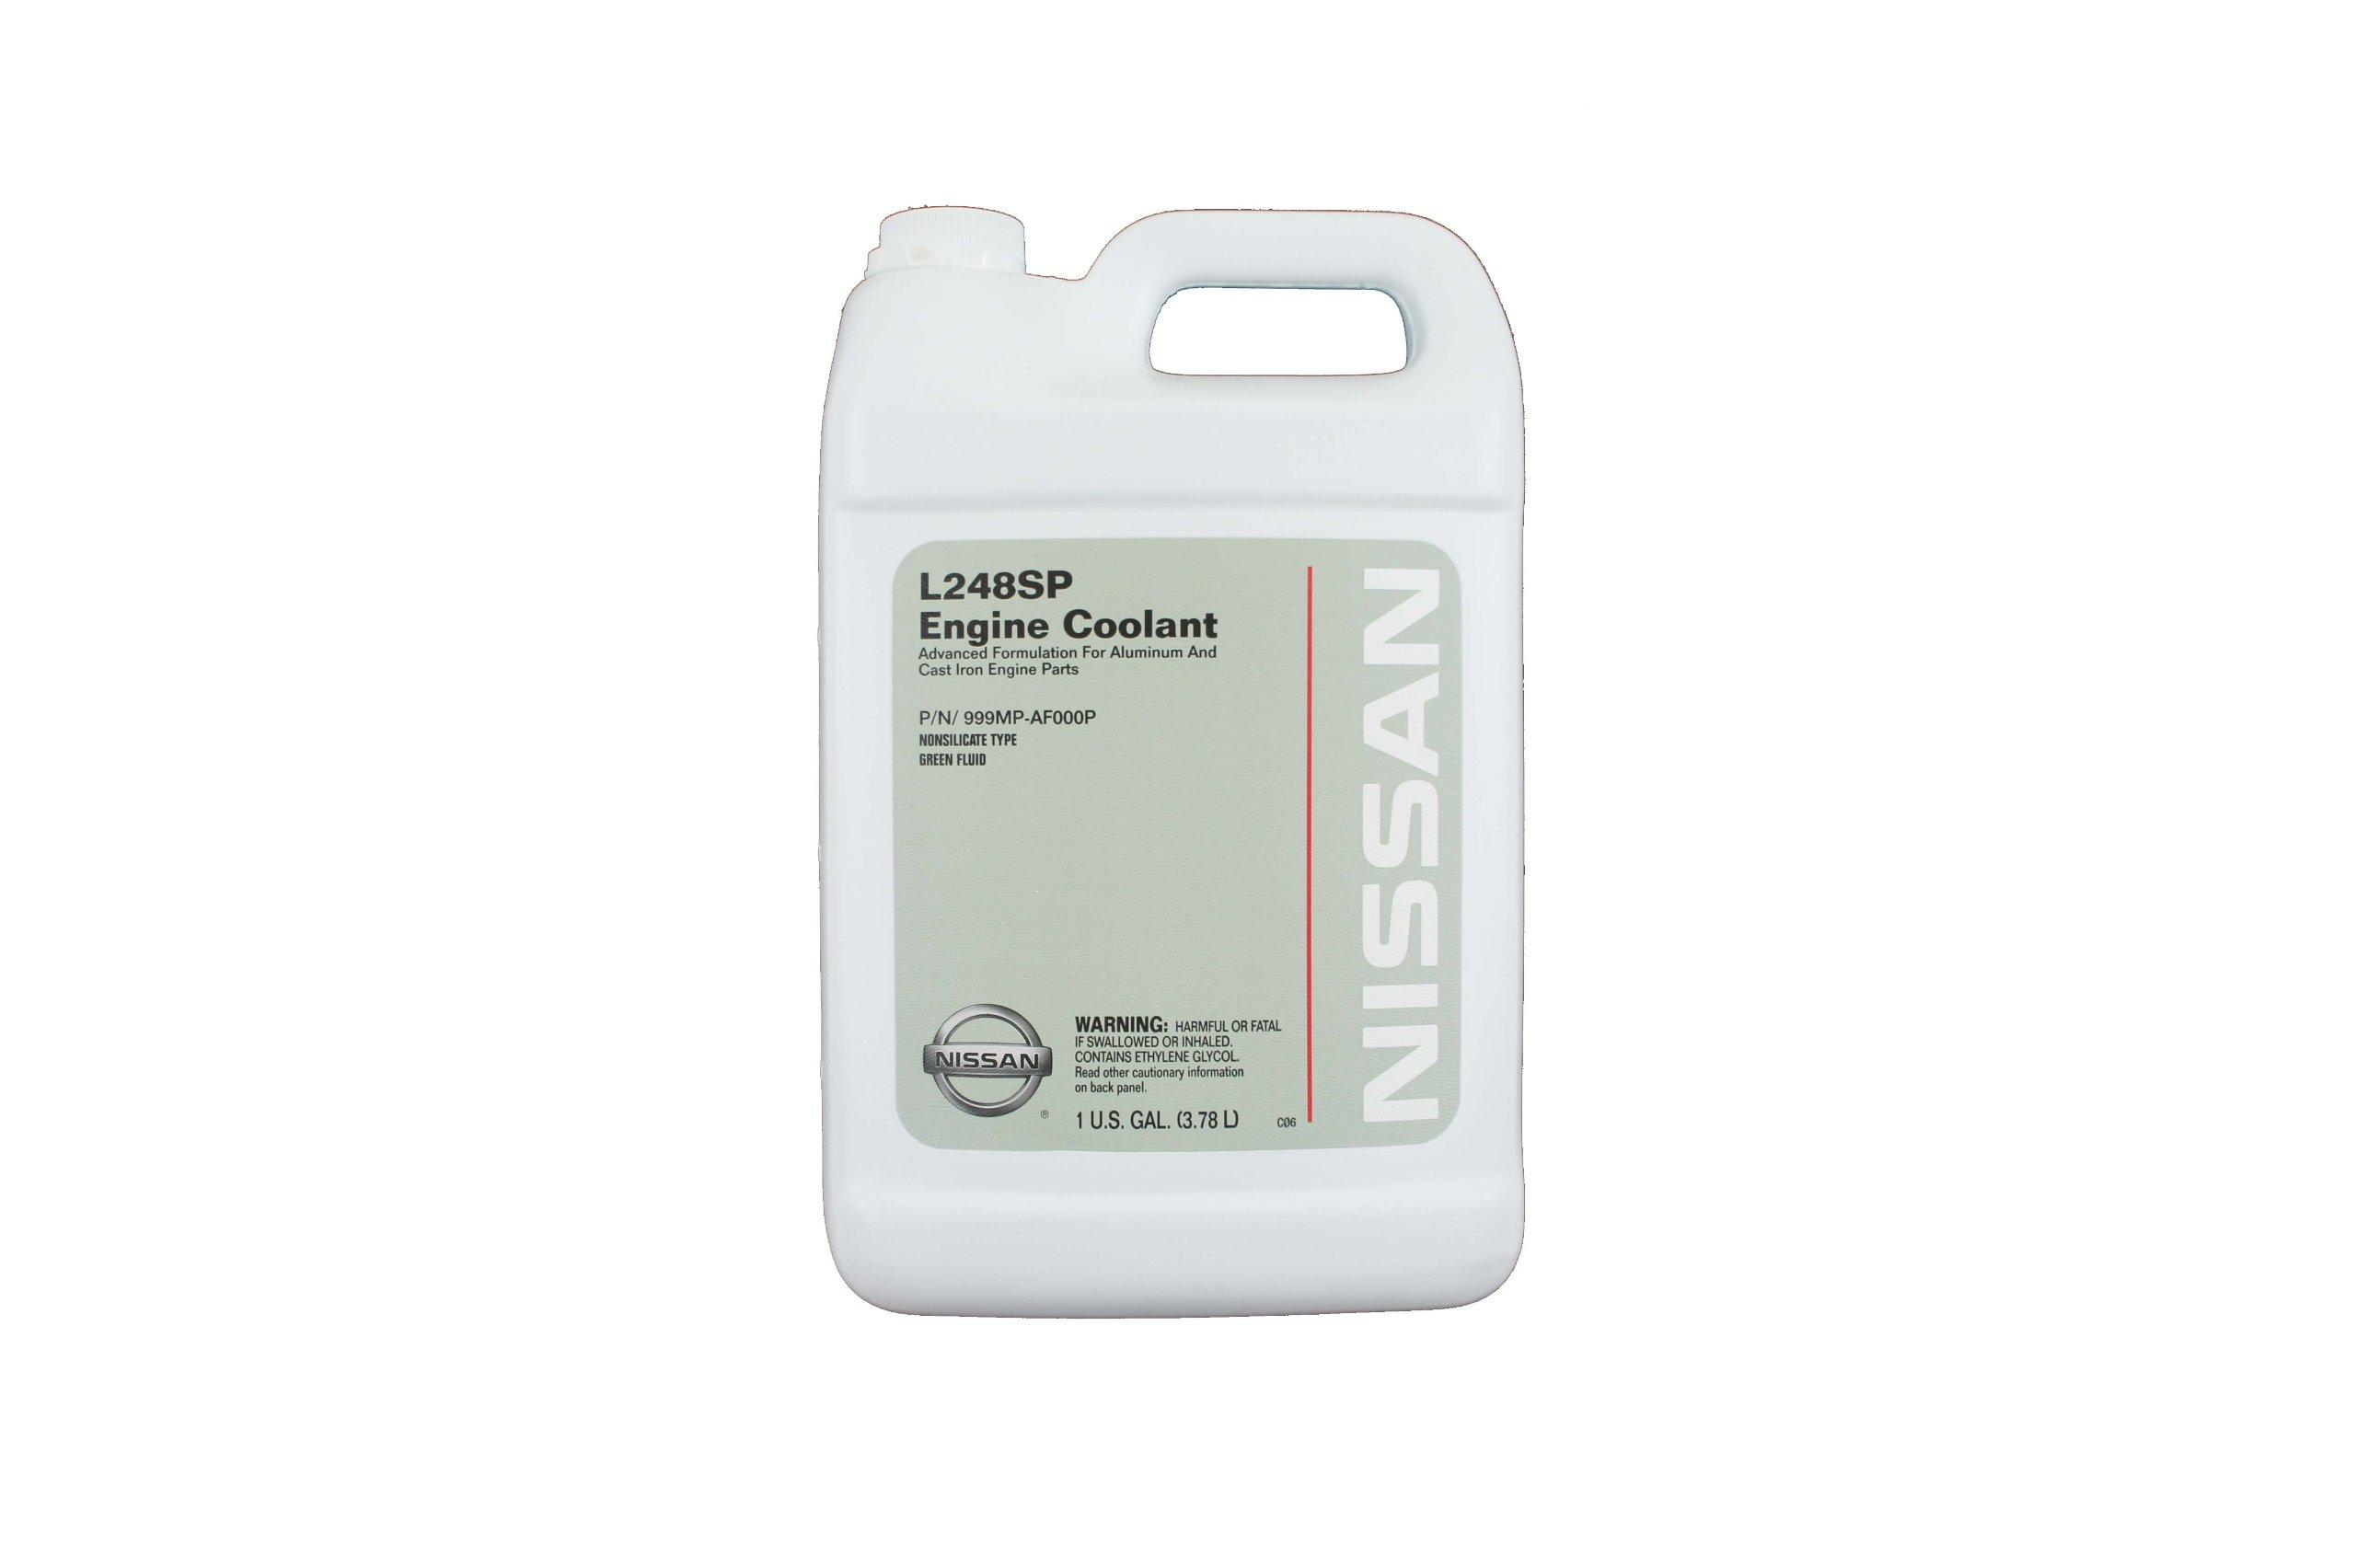 Nissan Genuine Fluid 999MP-AF000P Green L248SP Engine Coolant - 1 Gallon